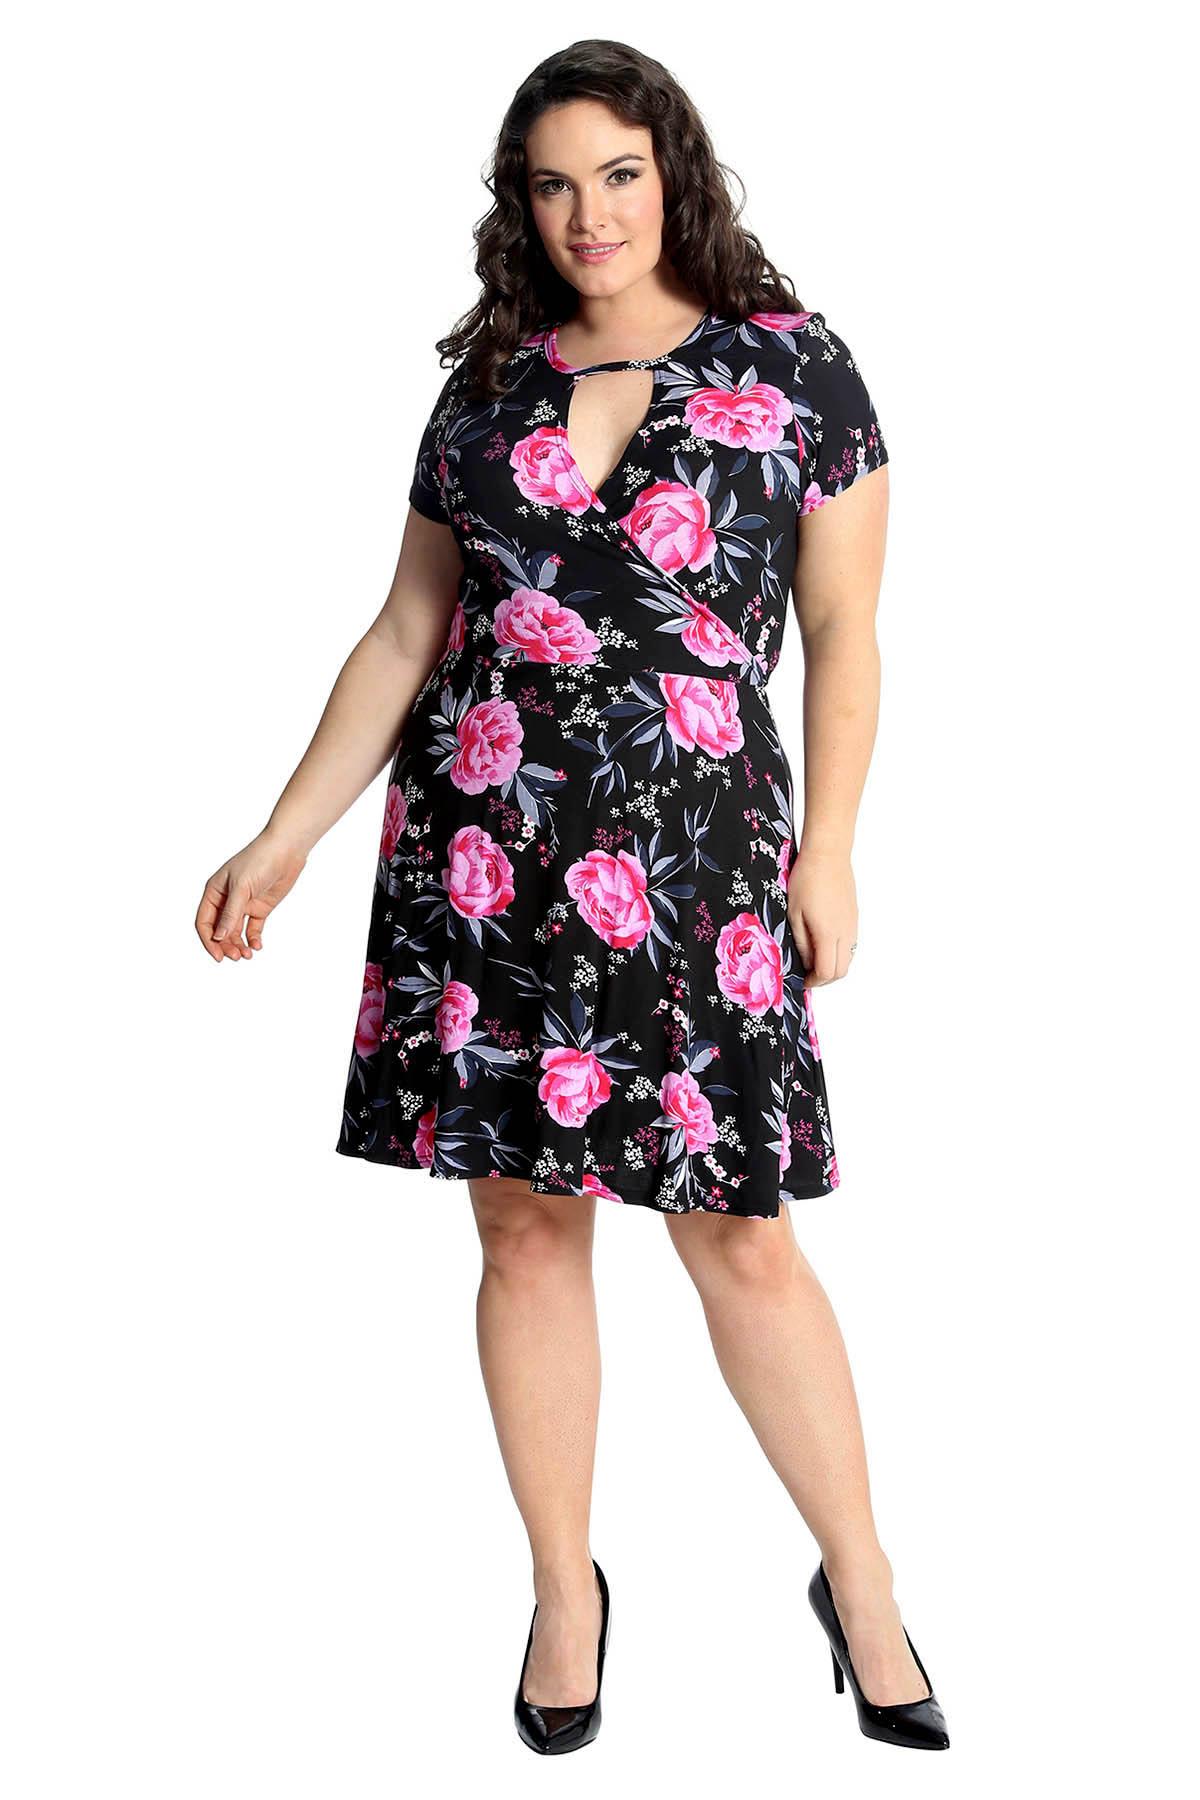 Details about New Womens Dress Plus Size Ladies Rose Floral Print Skater  Crossover Nouvelle